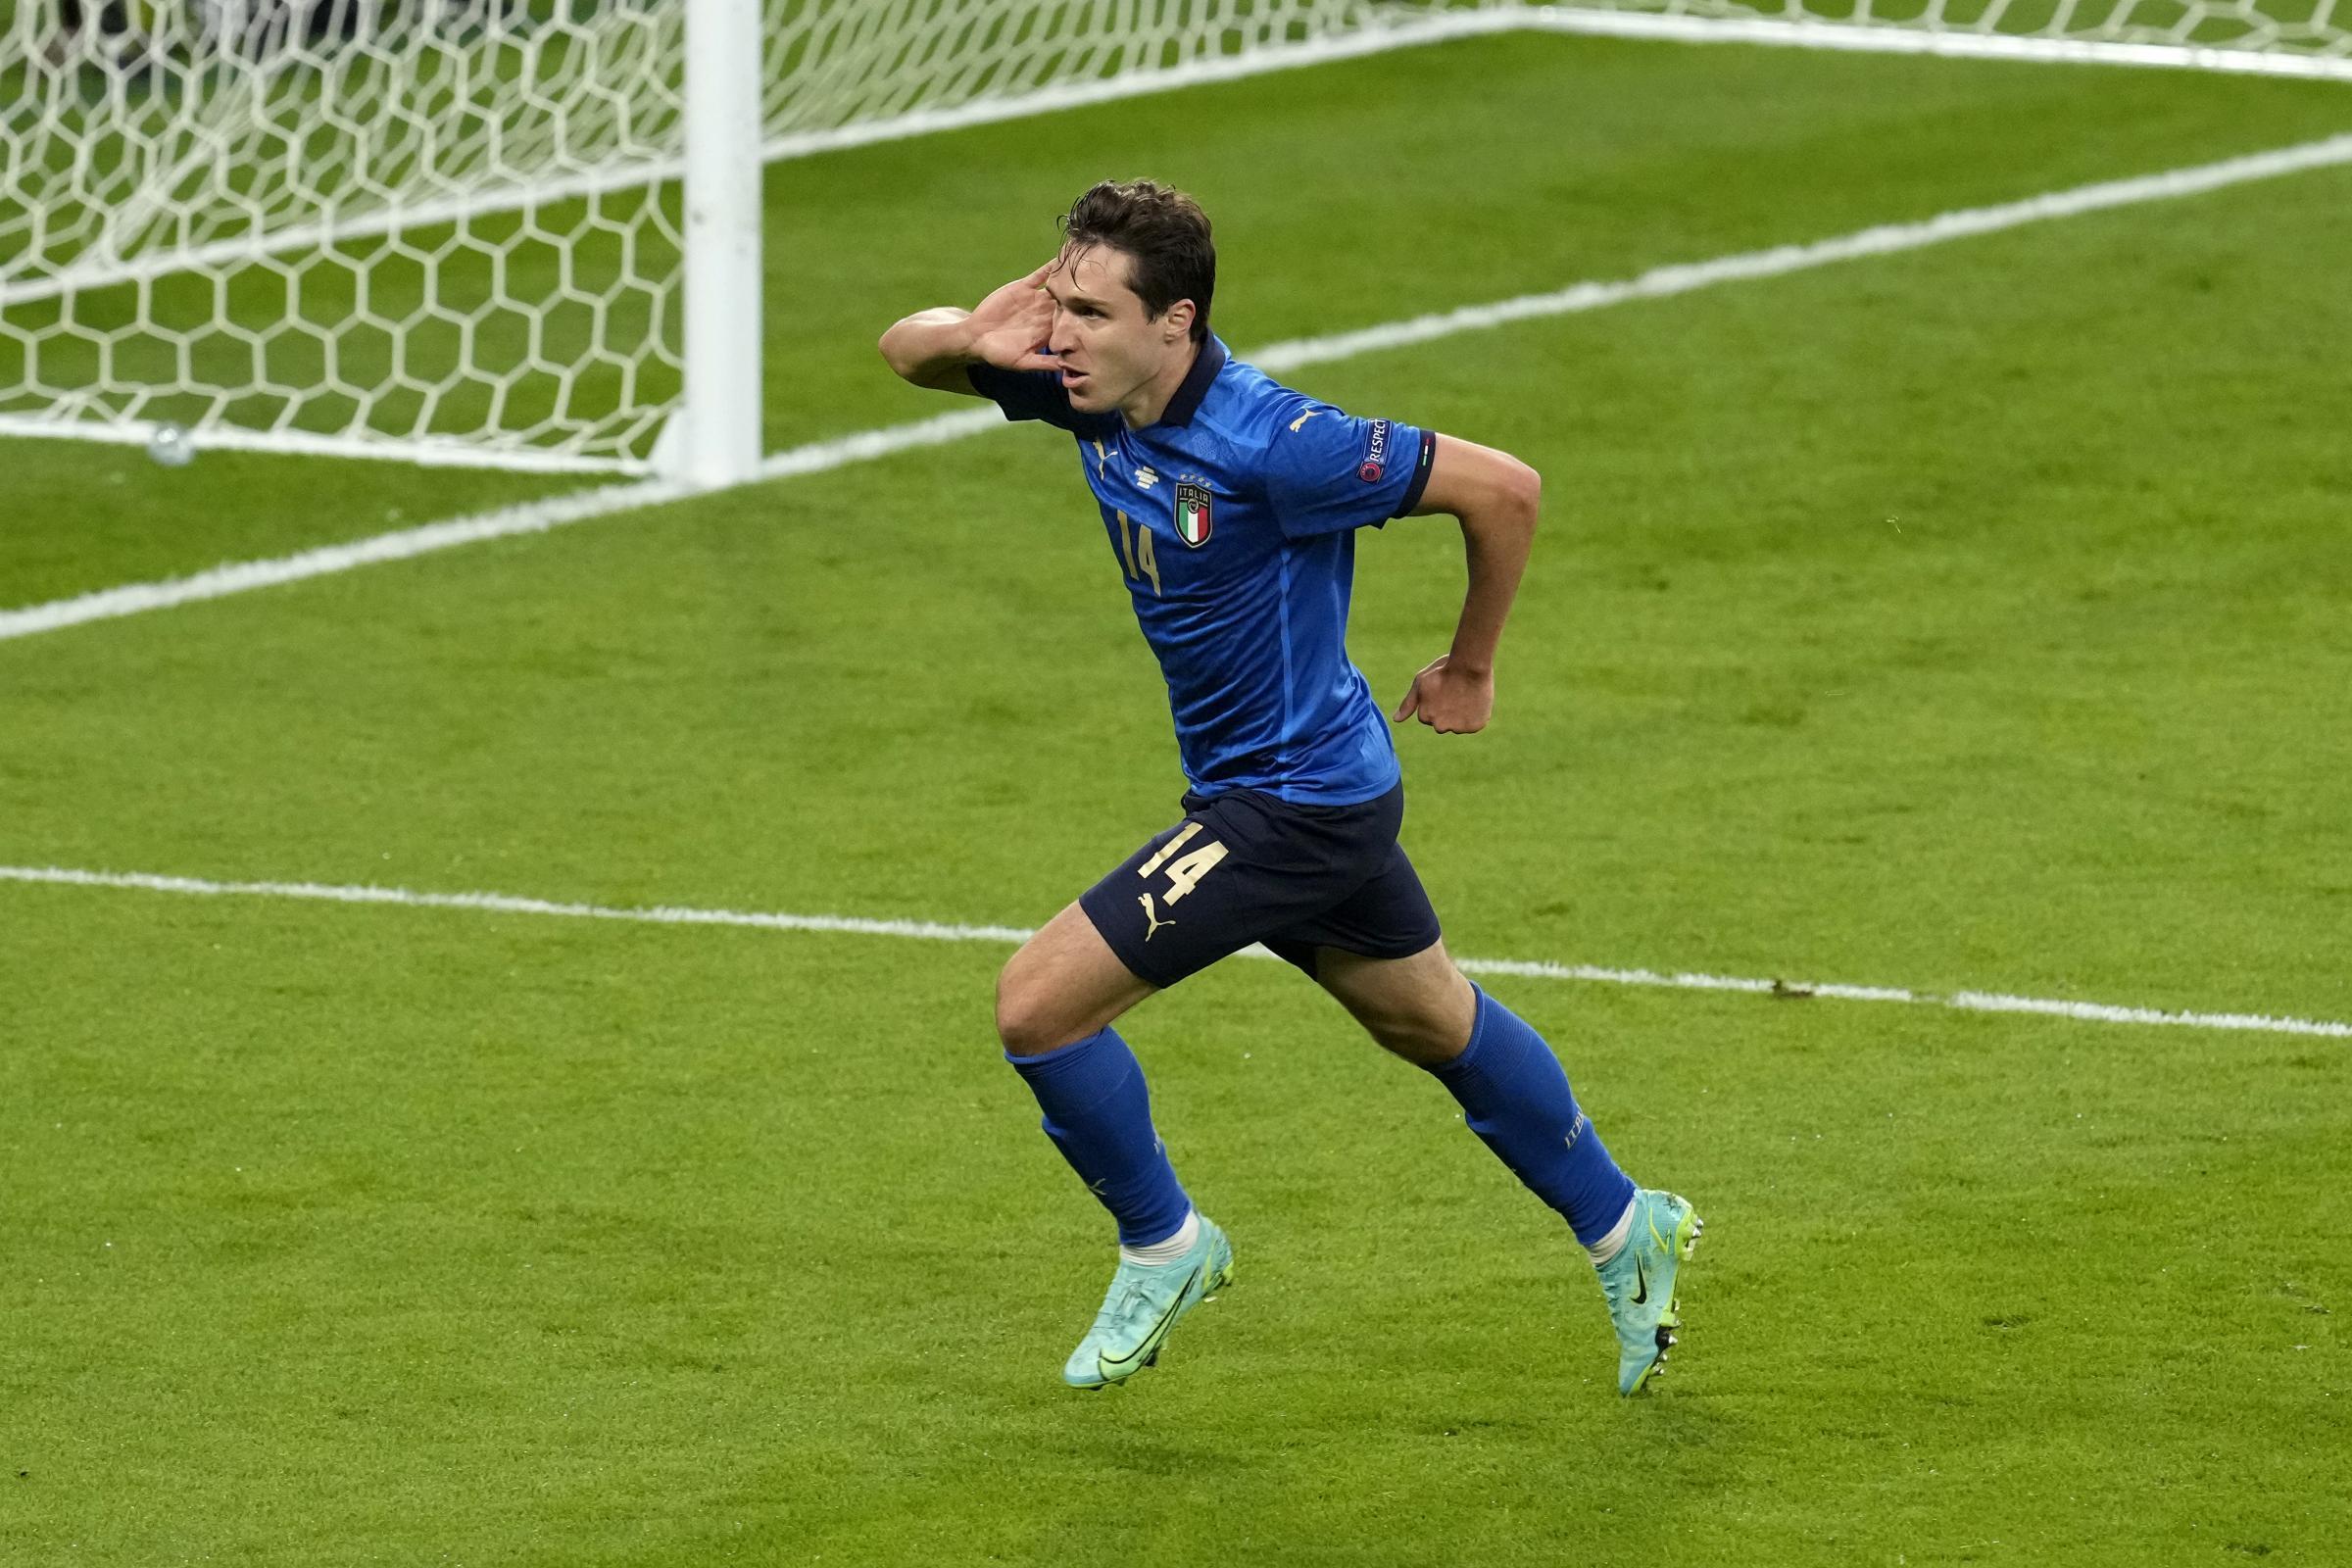 Italy 1 Spain 1 (Italy win 4-2 on penalties): Italians into the final as Alvaro Morata goes from villain to hero and back again